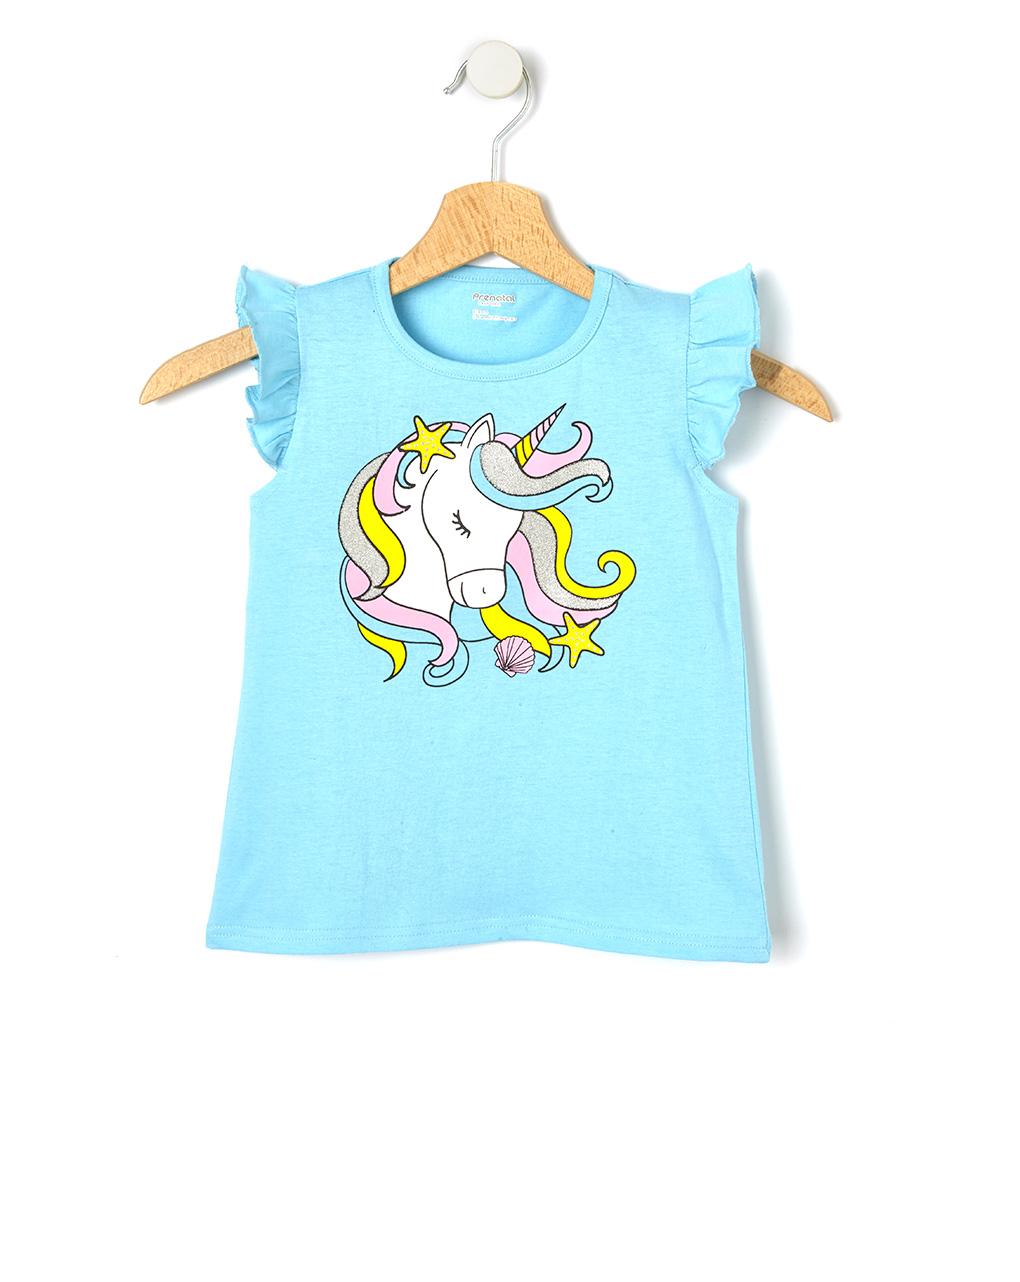 T-Shirt Jersey Γαλάζιο με Στάμπα για Κορίτσι